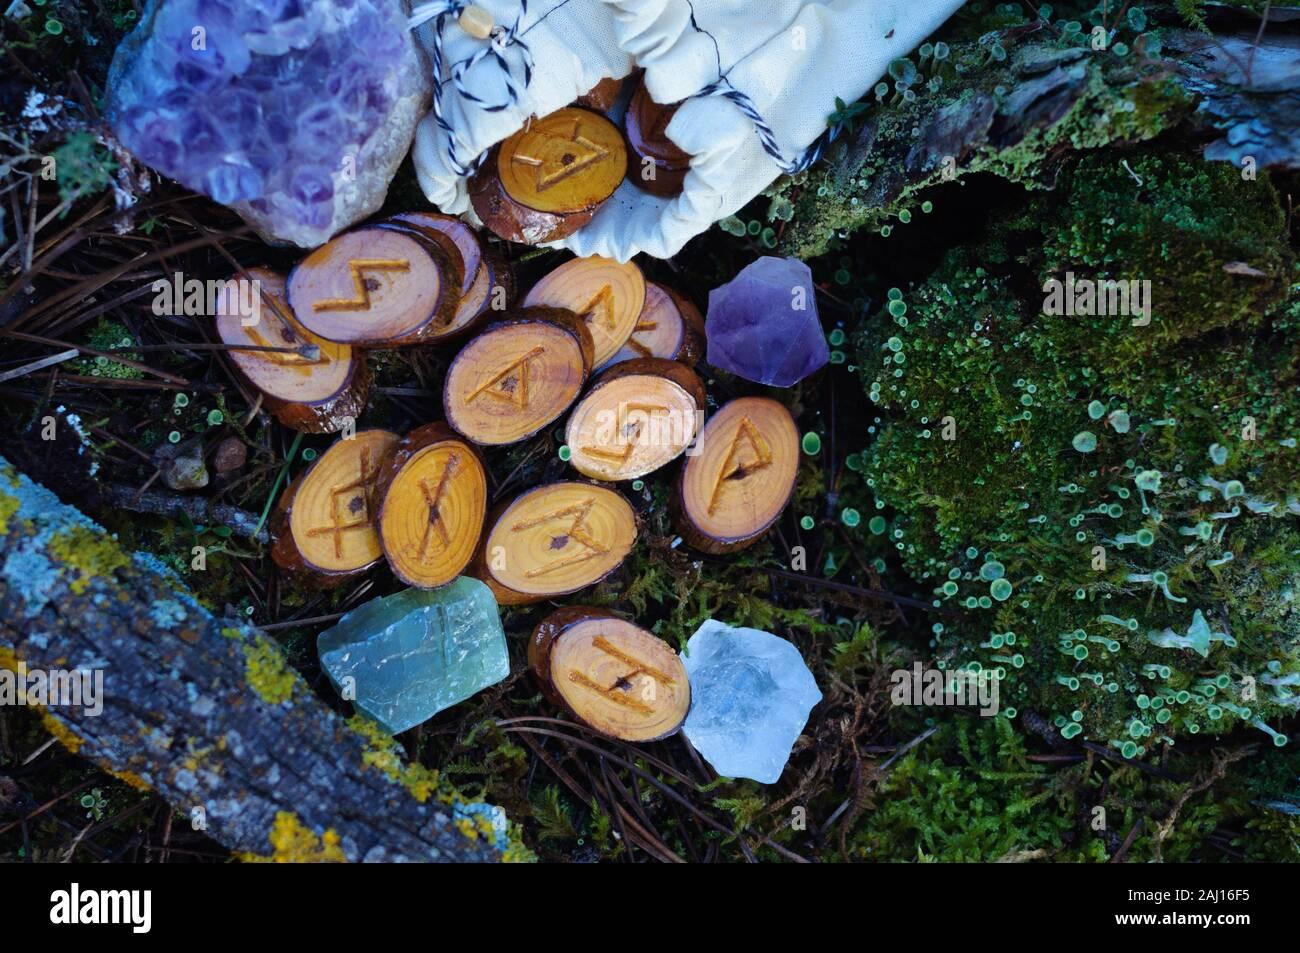 Wooden Homemade Runes Scattered On The Green Grass Moss Stock